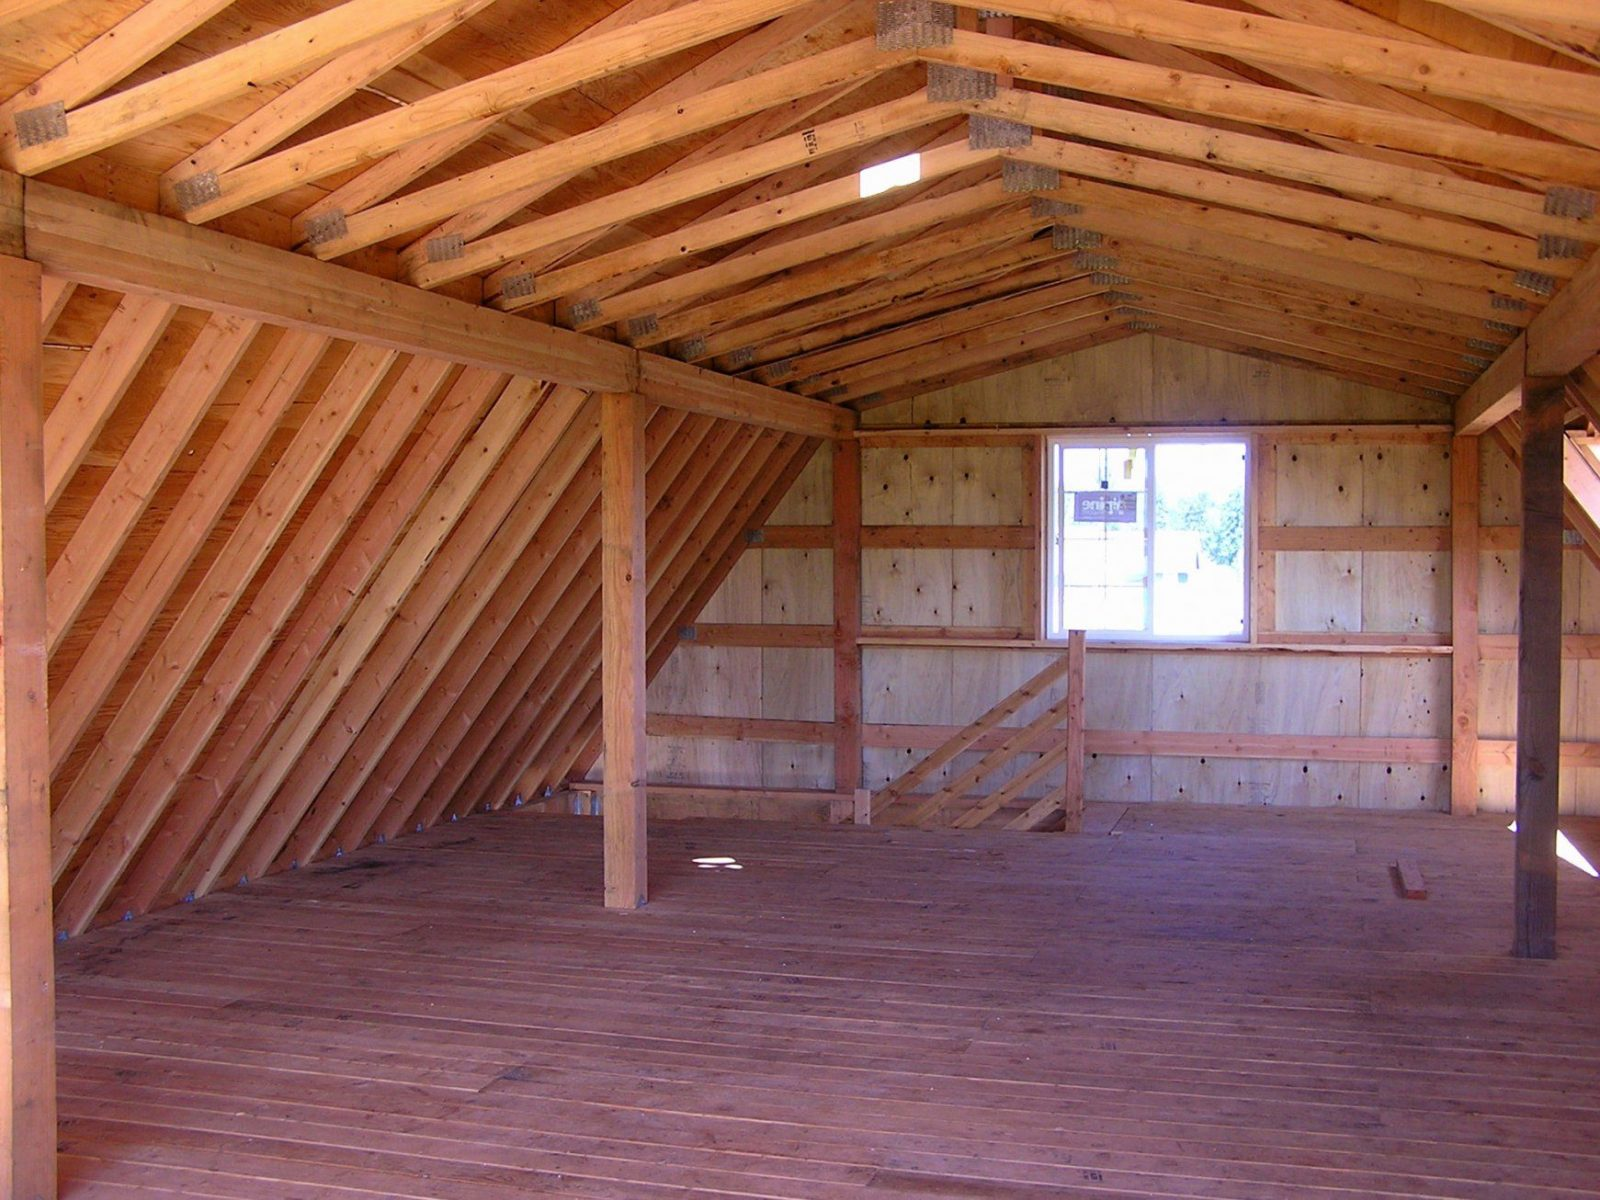 Menards Pole Barn Kits Reviews Elegant Menards House Floor Plans von Menards Pole Barns Reviews Bild